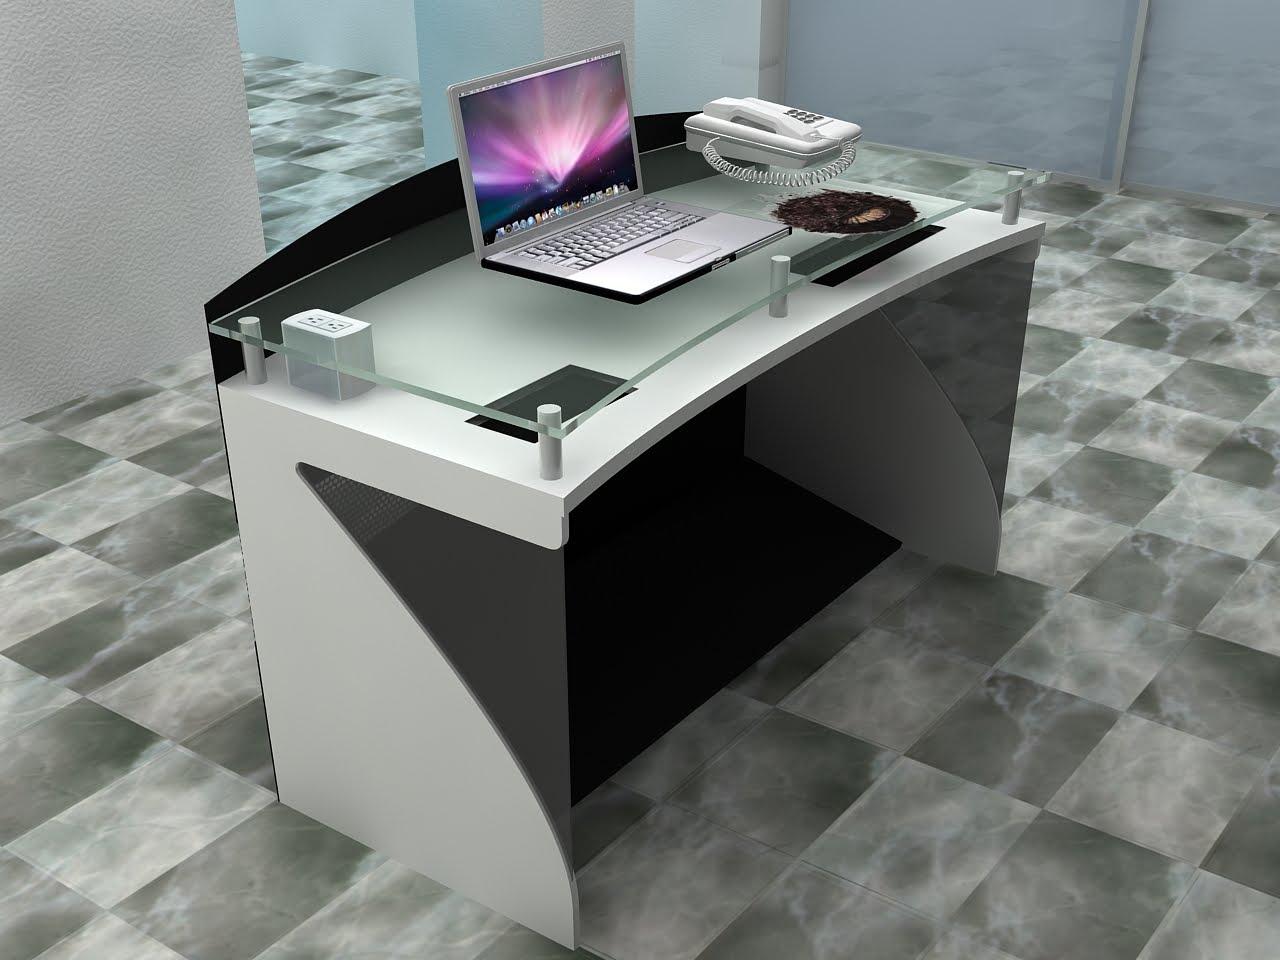 Conceptos en mobiliario de oficina for Que es mobiliario de oficina